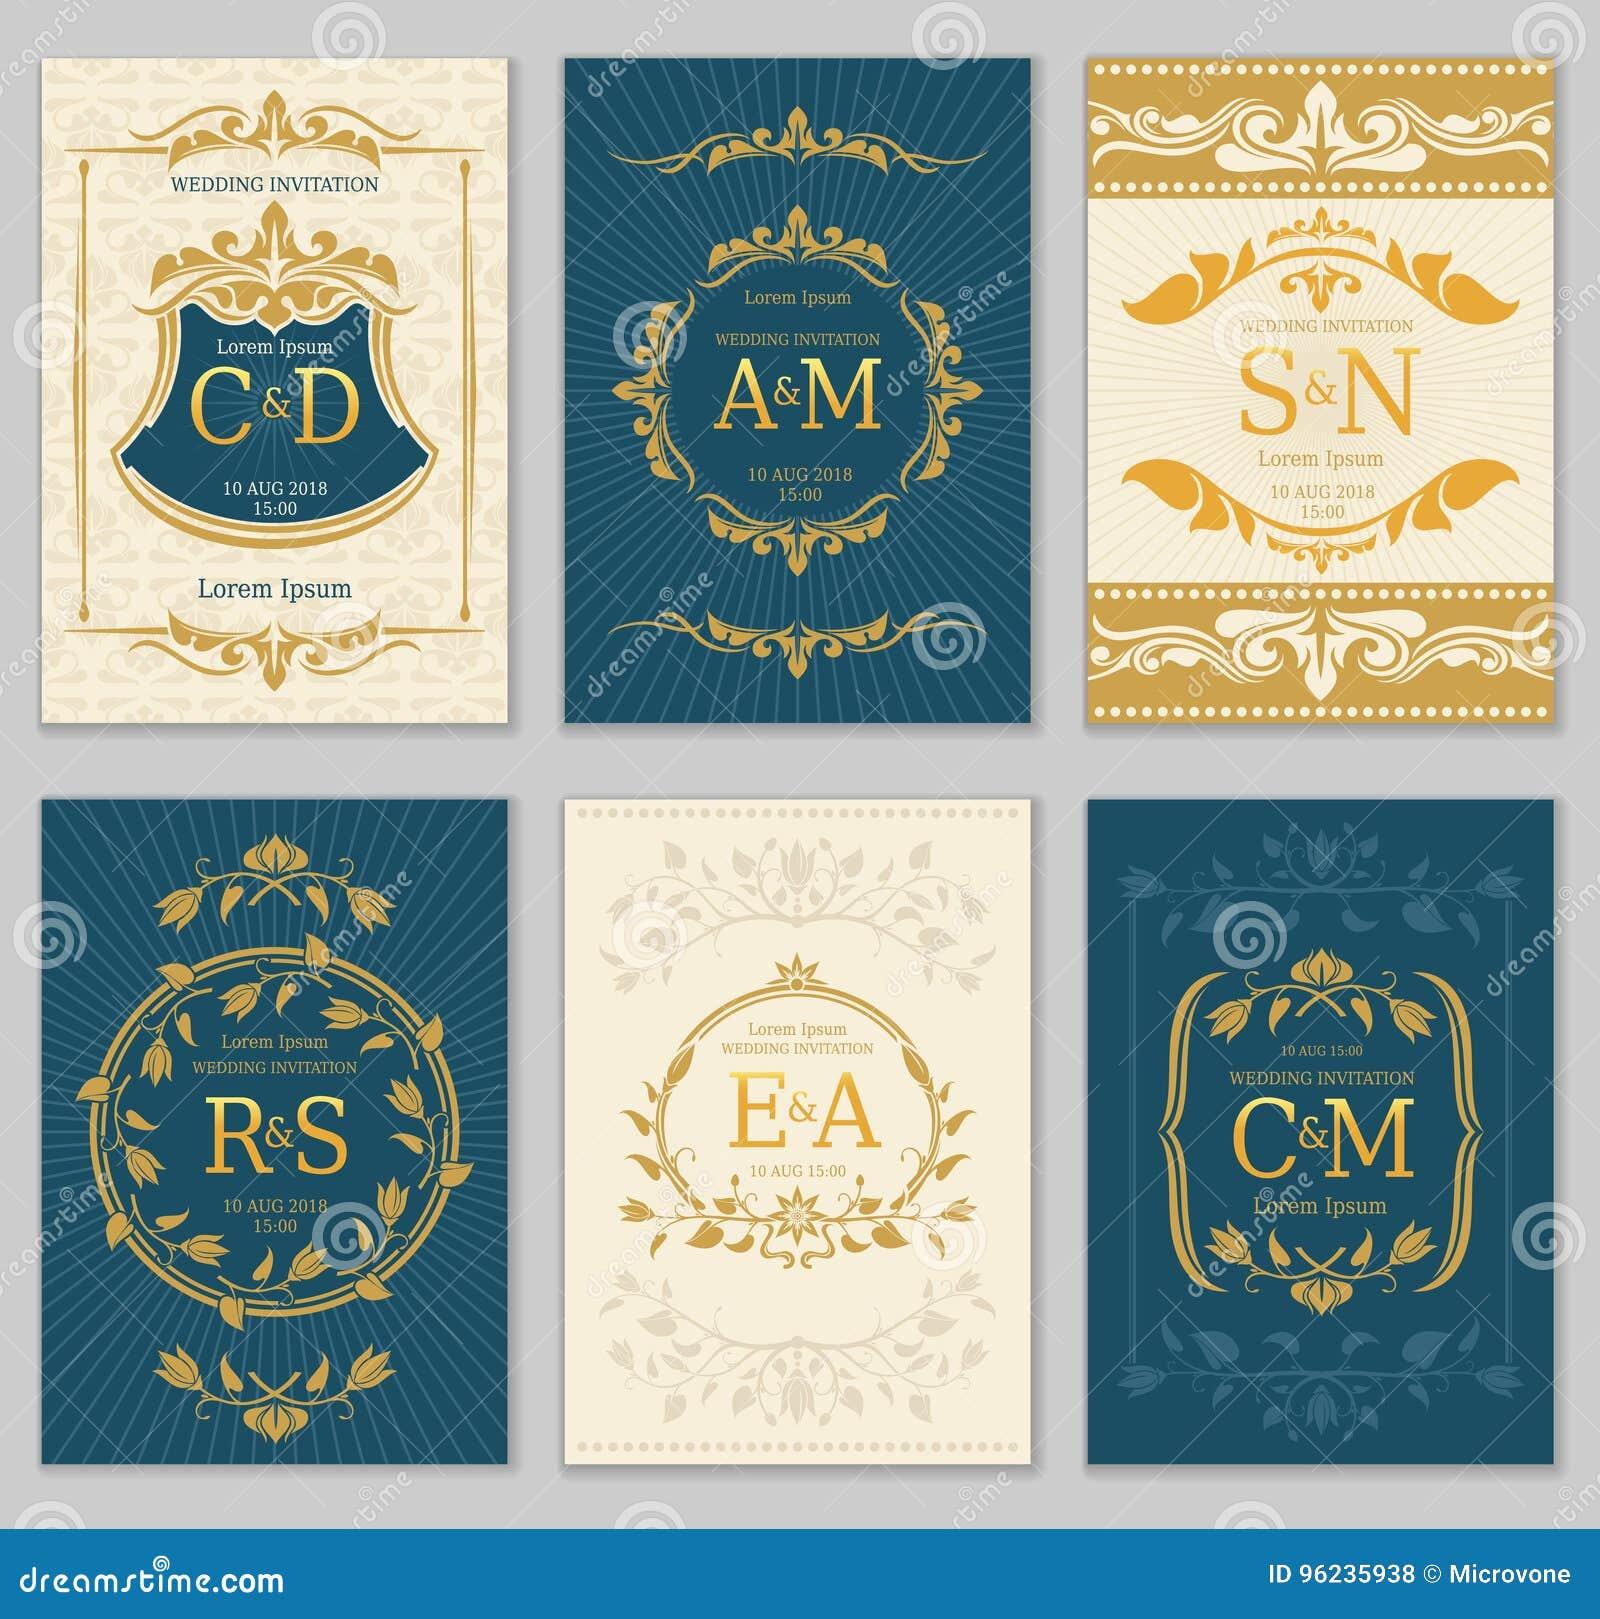 Luxury Vintage Wedding Invitation Vector Cards With Logo